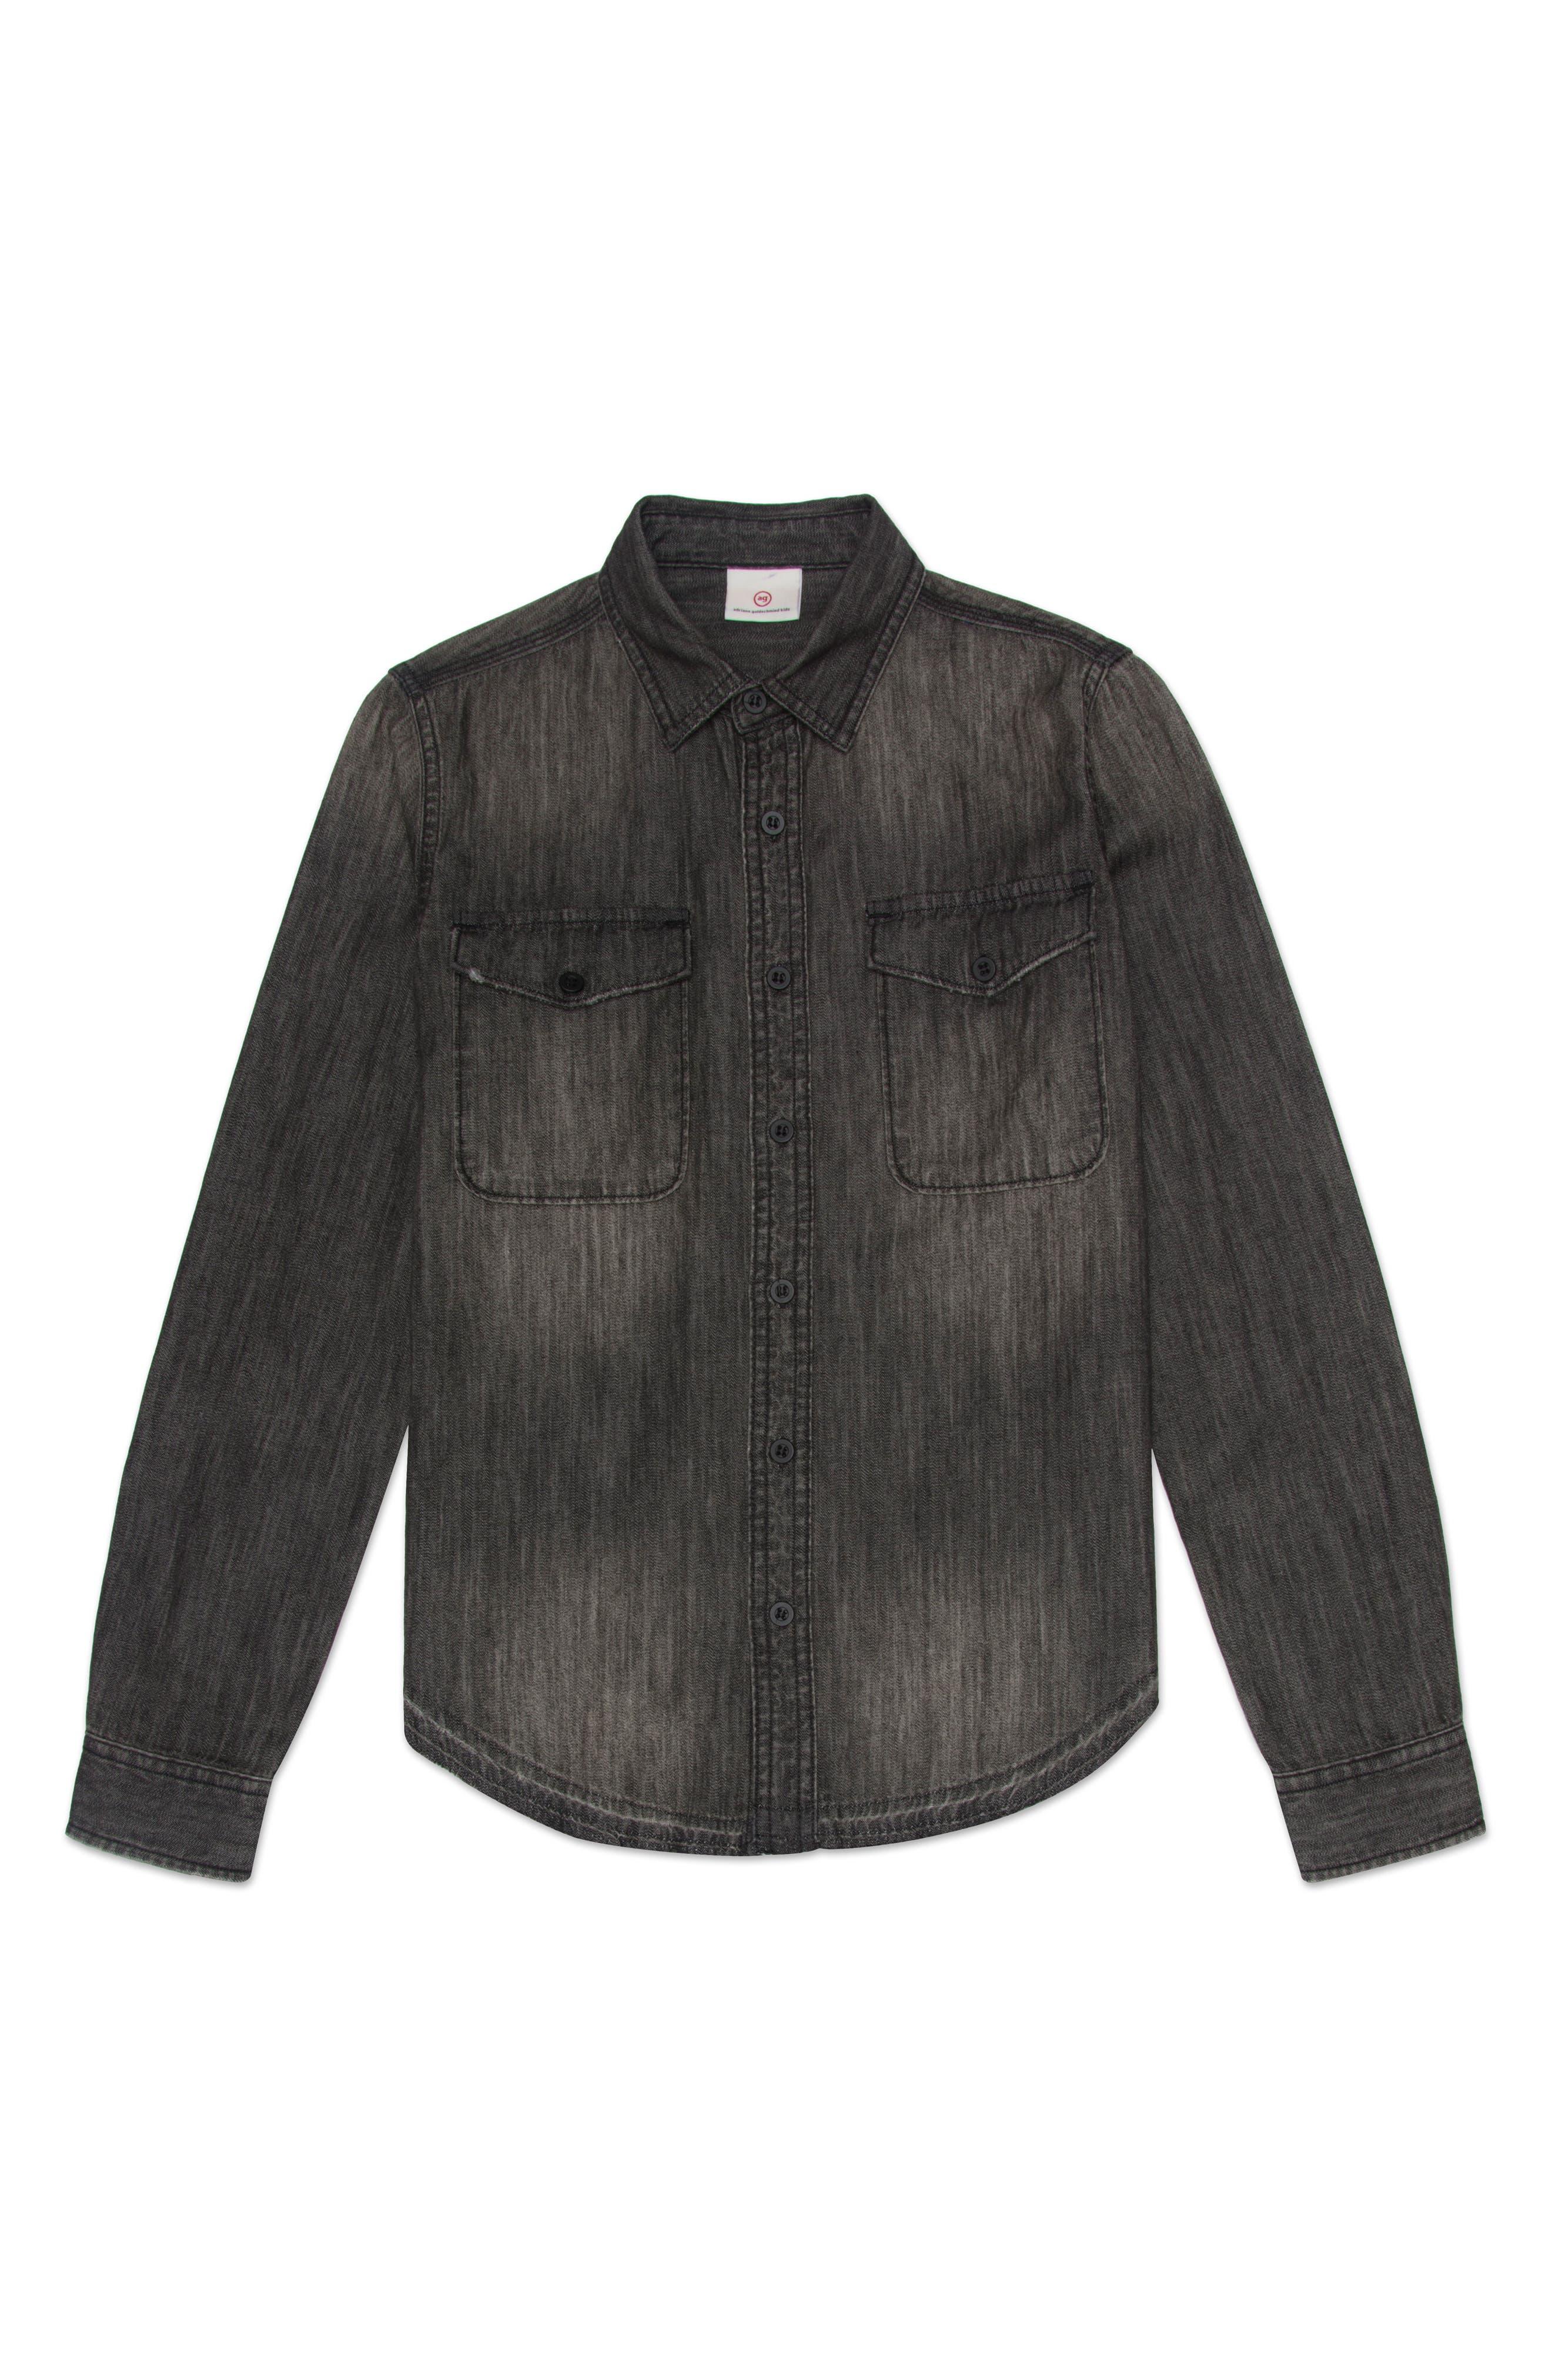 Bryson Shirt,                         Main,                         color, Faded Black